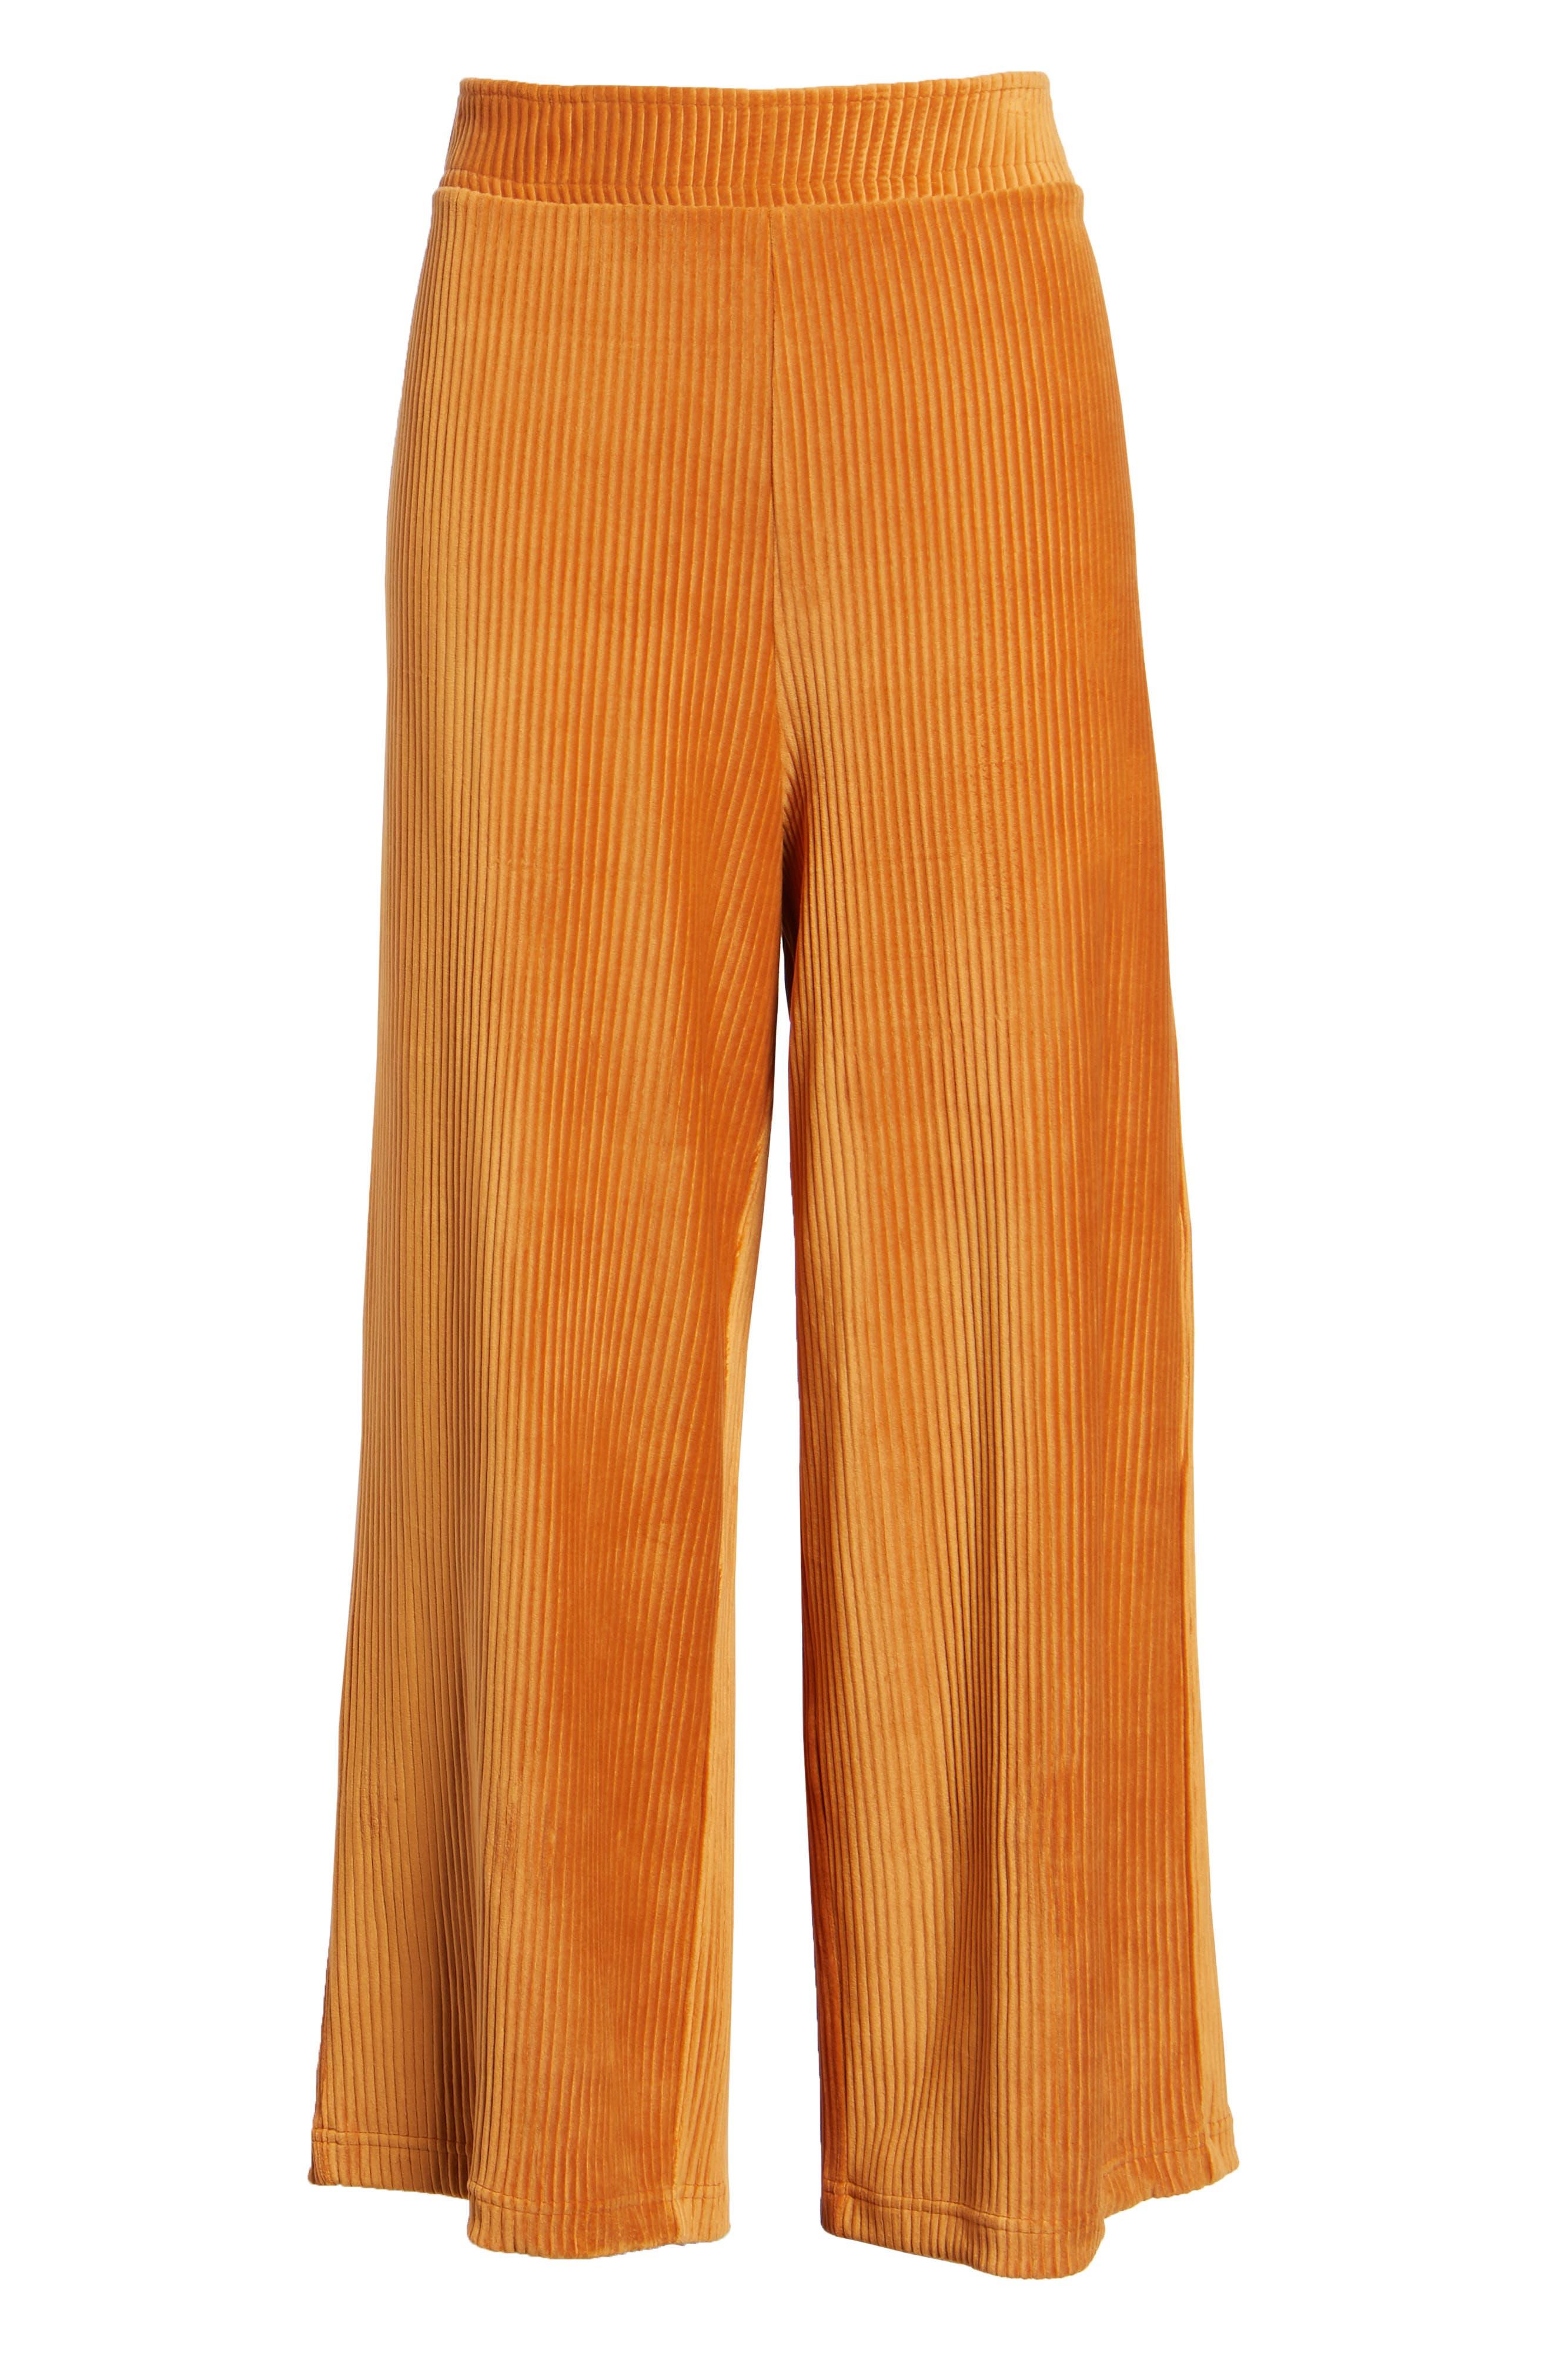 High Rise Knit Corduroy Crop Pants,                             Alternate thumbnail 8, color,                             RUST CIDER